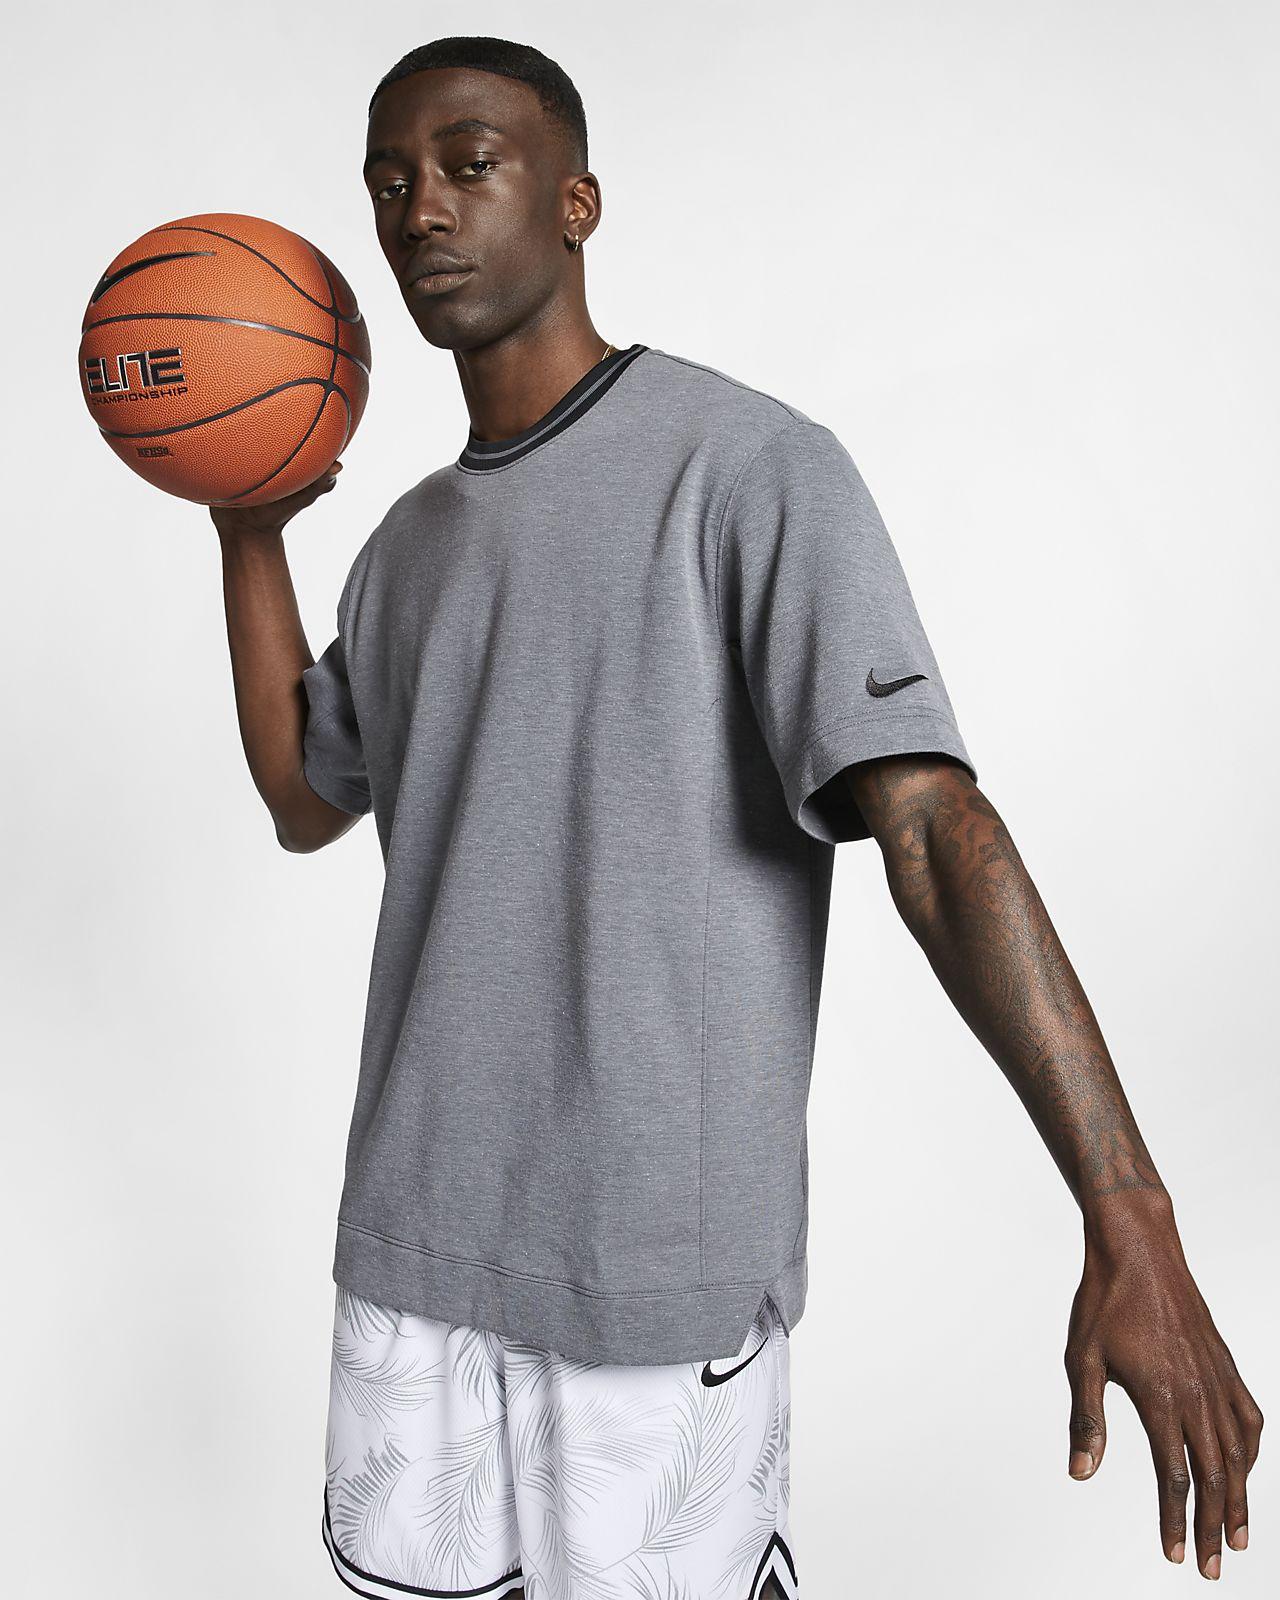 8f57ba345d829 Nike Dri-FIT Men's Short-Sleeve Basketball Top. Nike.com